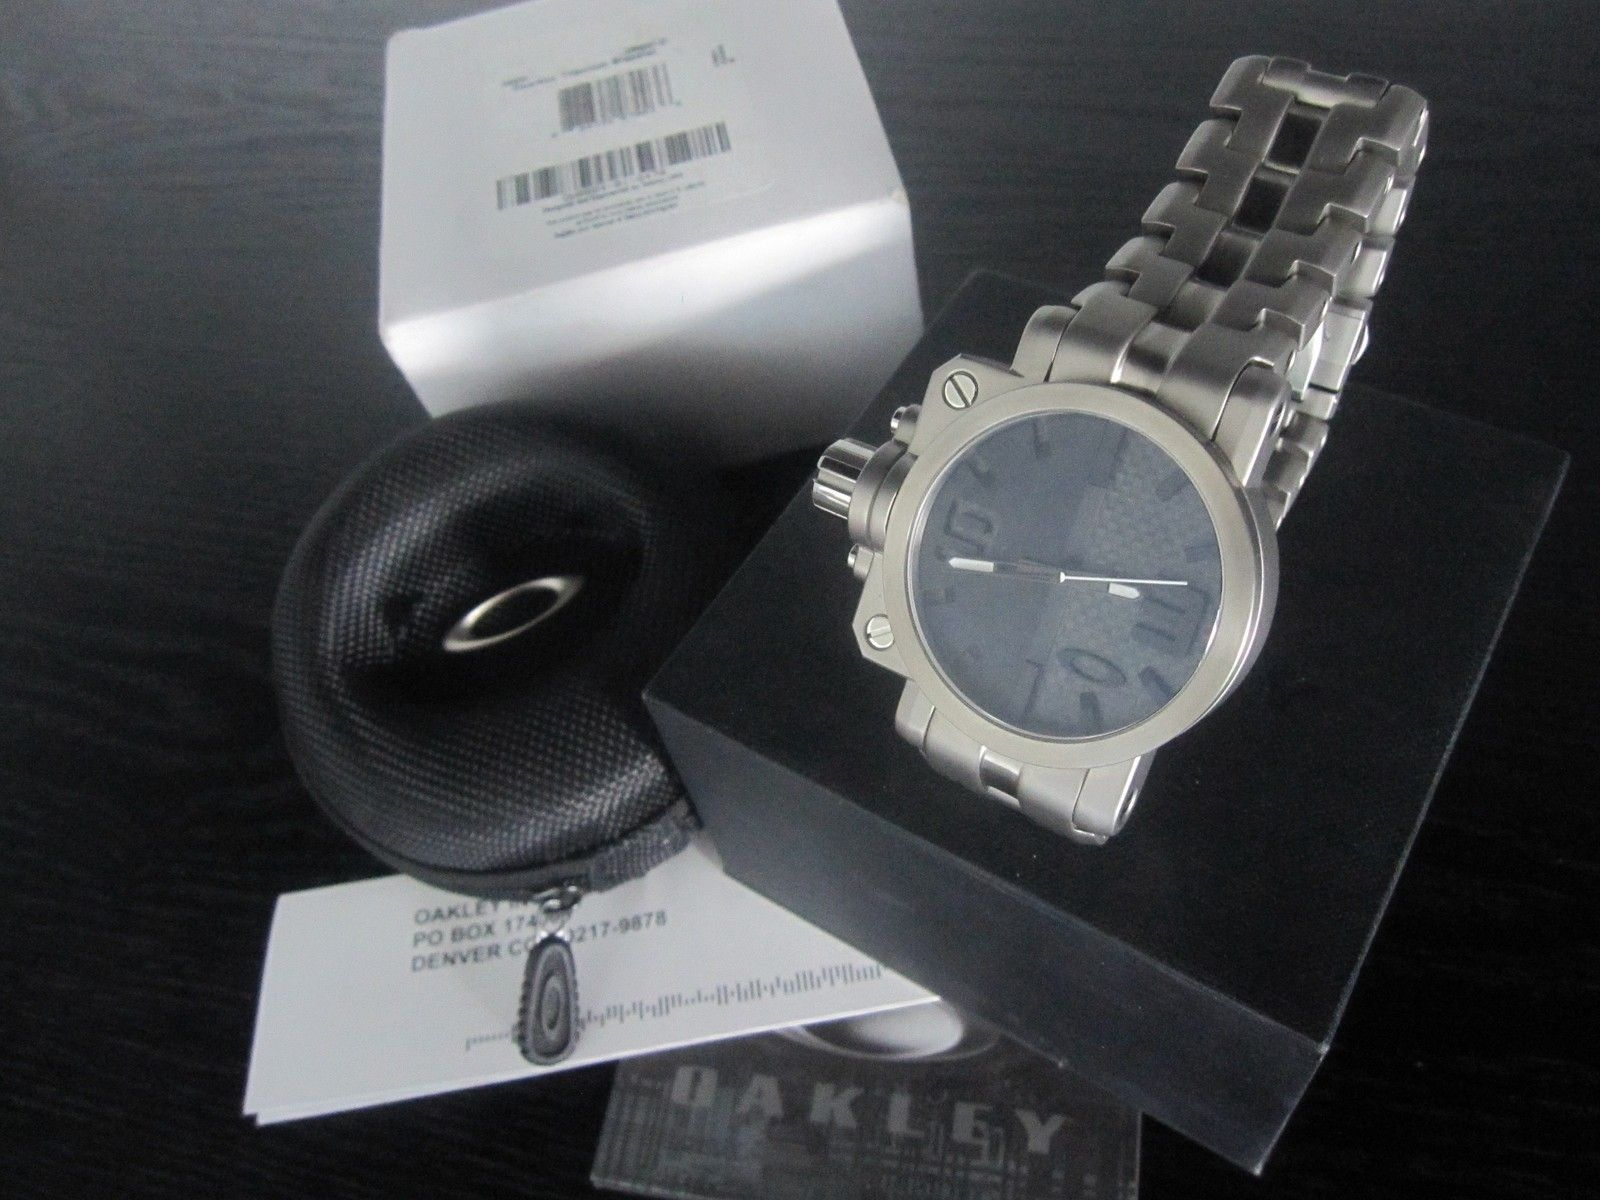 BNIB Gearbox Titanium Bracelet Watch - OW0004-01 - IMG_2493.JPG